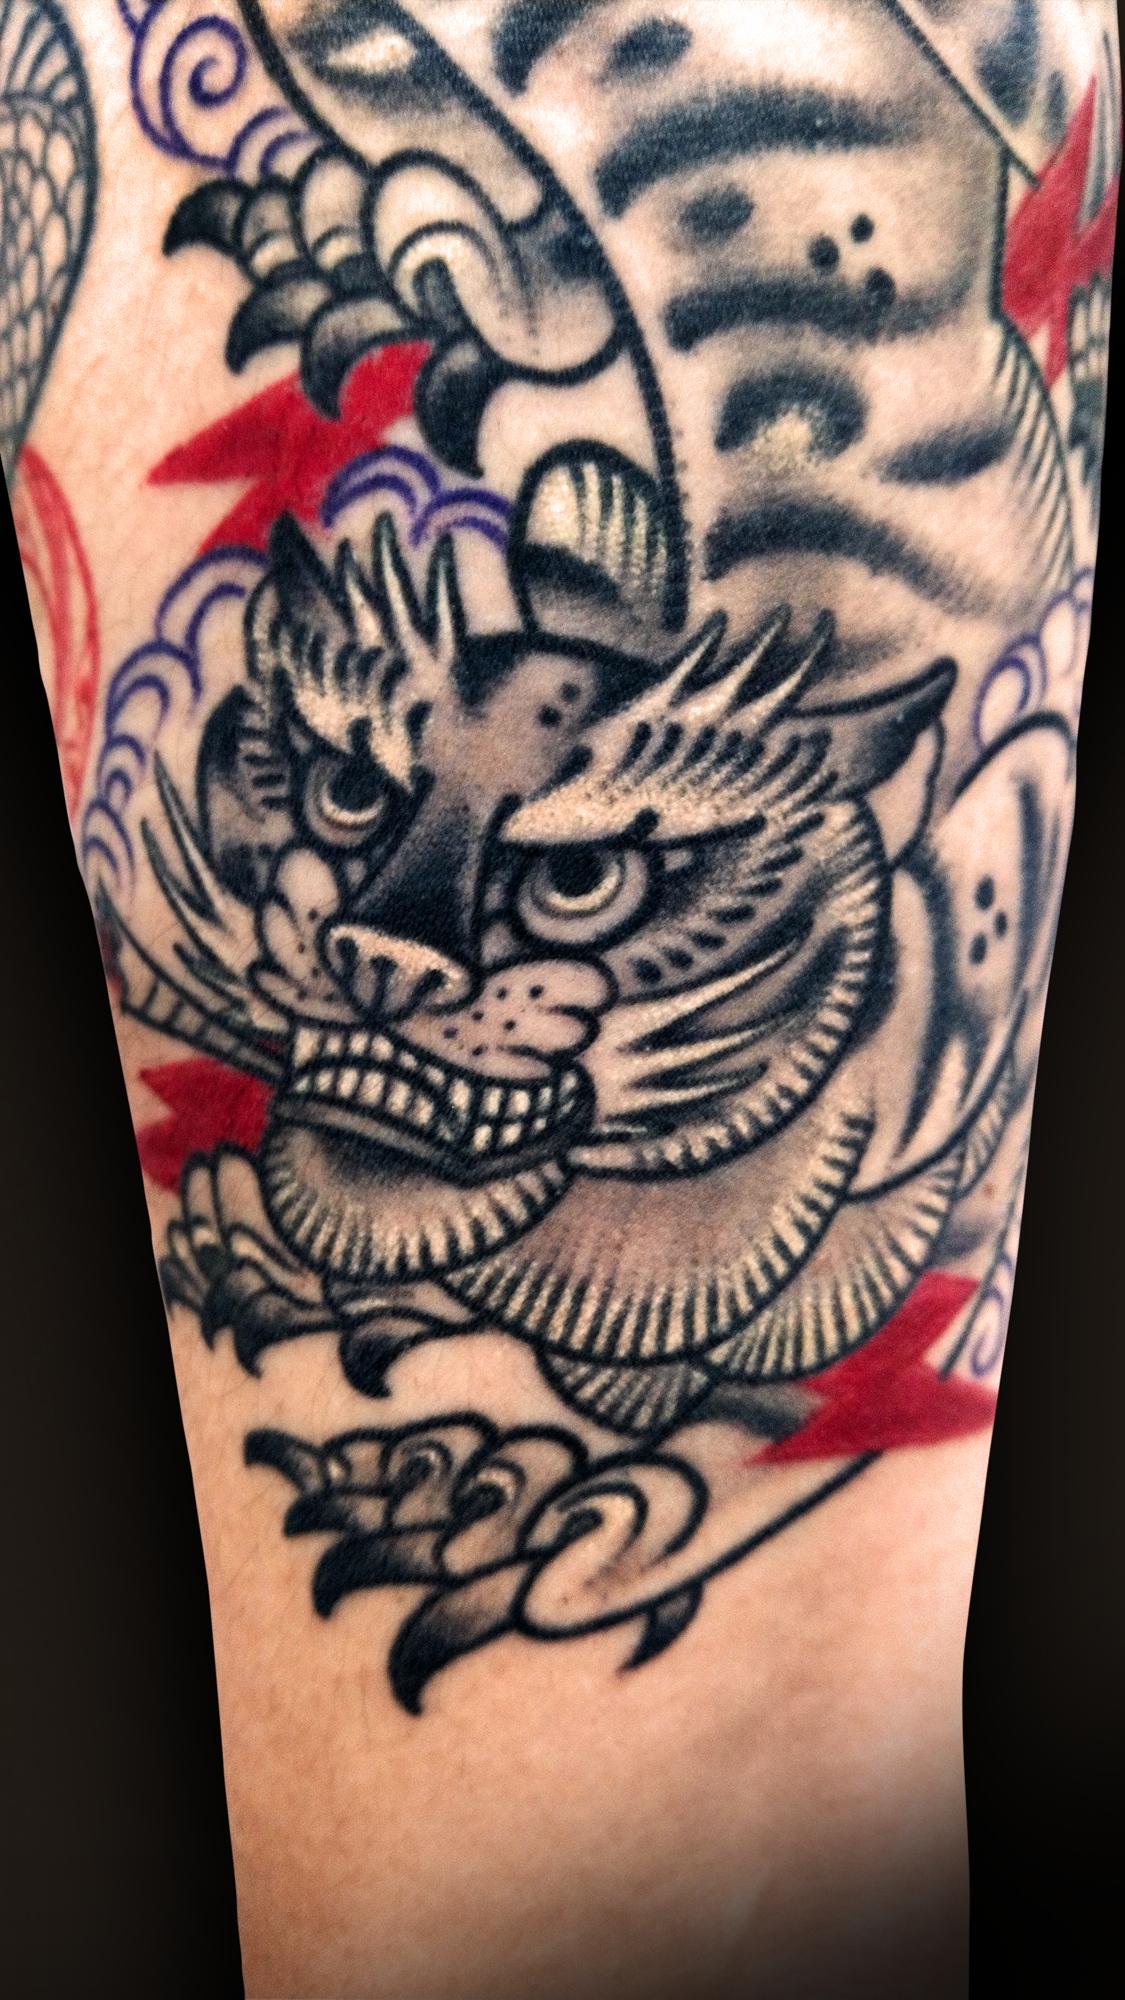 KING RAT TATTOO 作品 | LAVA gallery | Tattoo artist: Yuji Anai | キングラット | ラバギャラリー | タトゥーアート | 福岡県北九州市 | KIMG0084